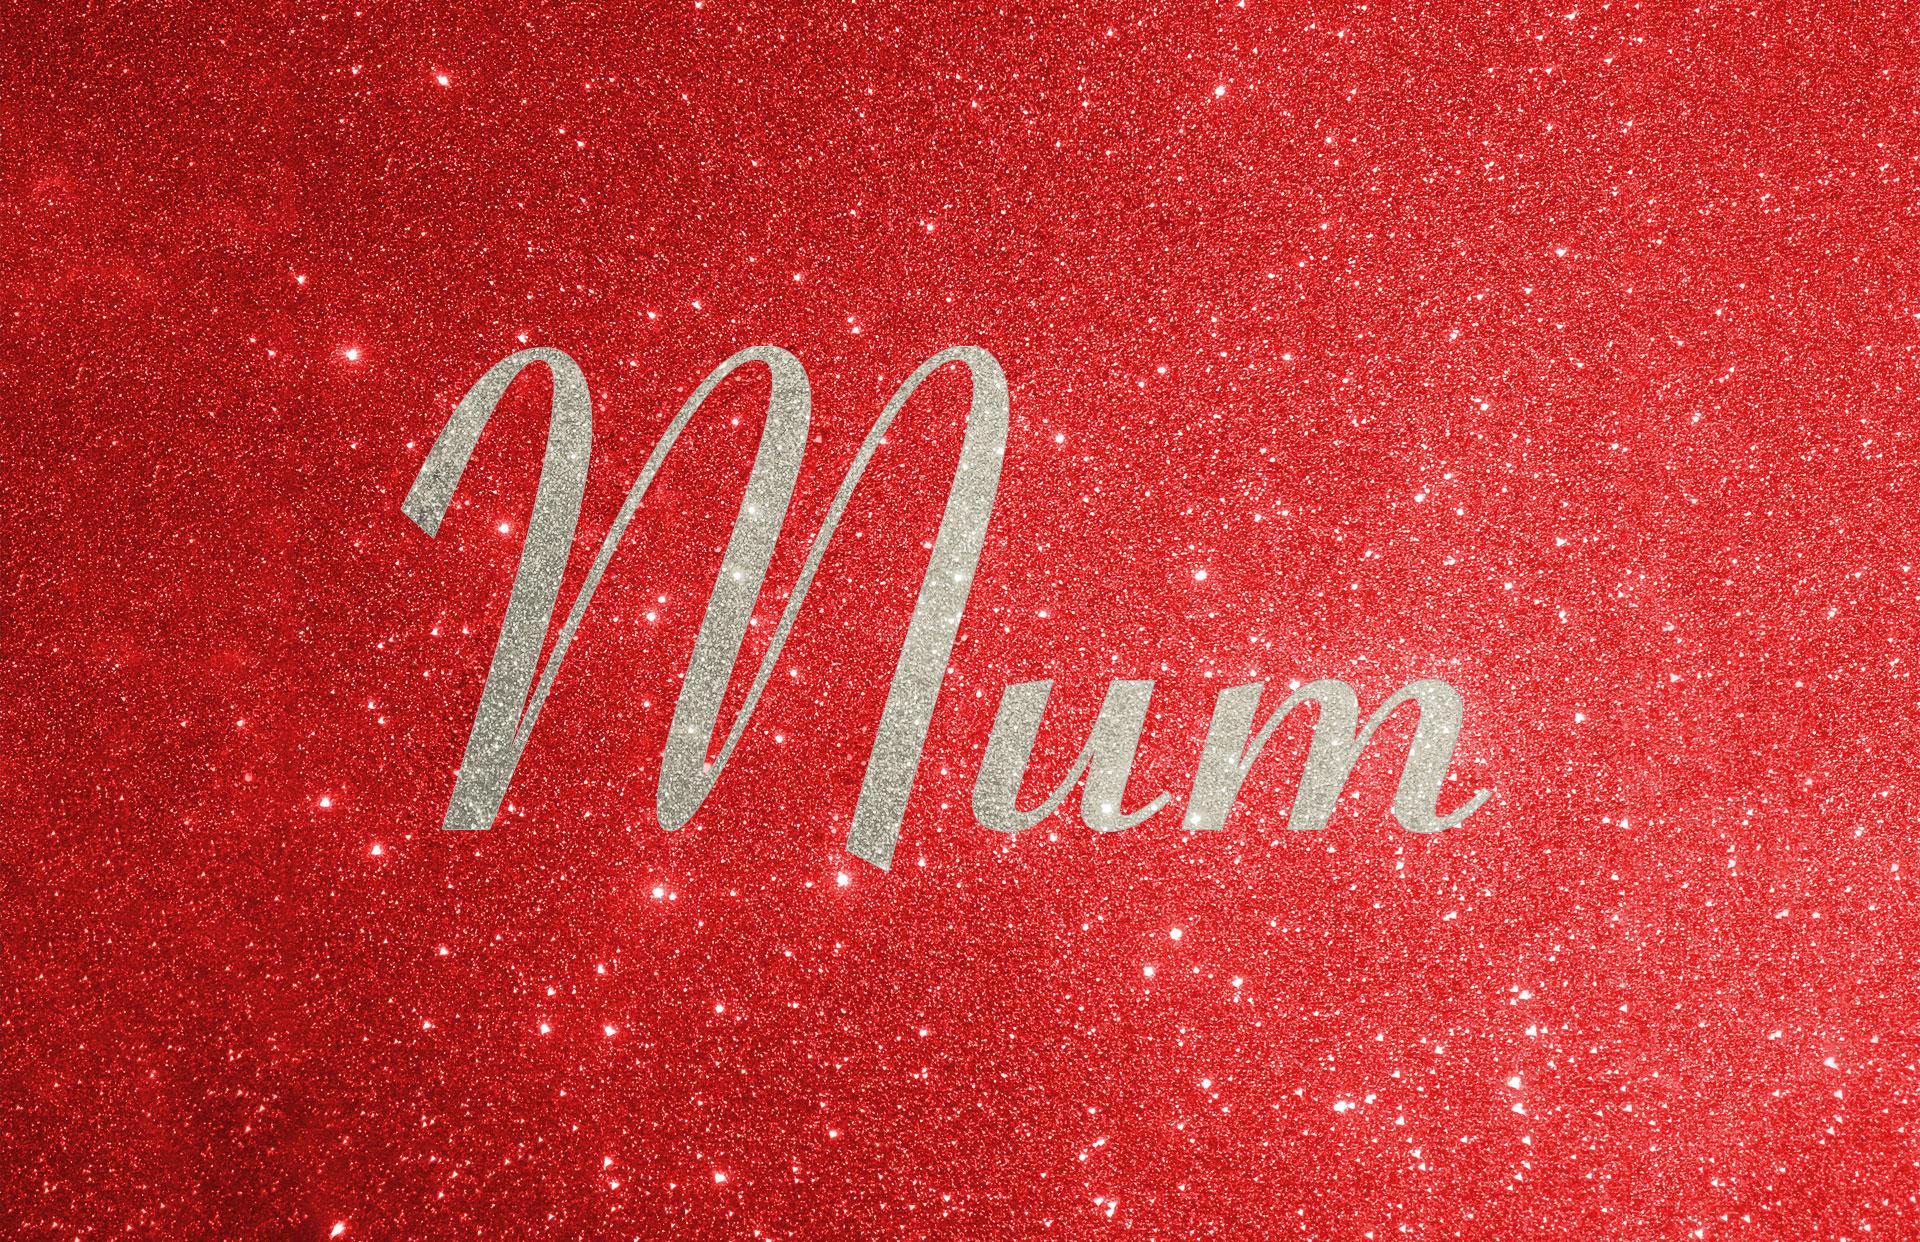 Glitter contrast wording shown in platinum